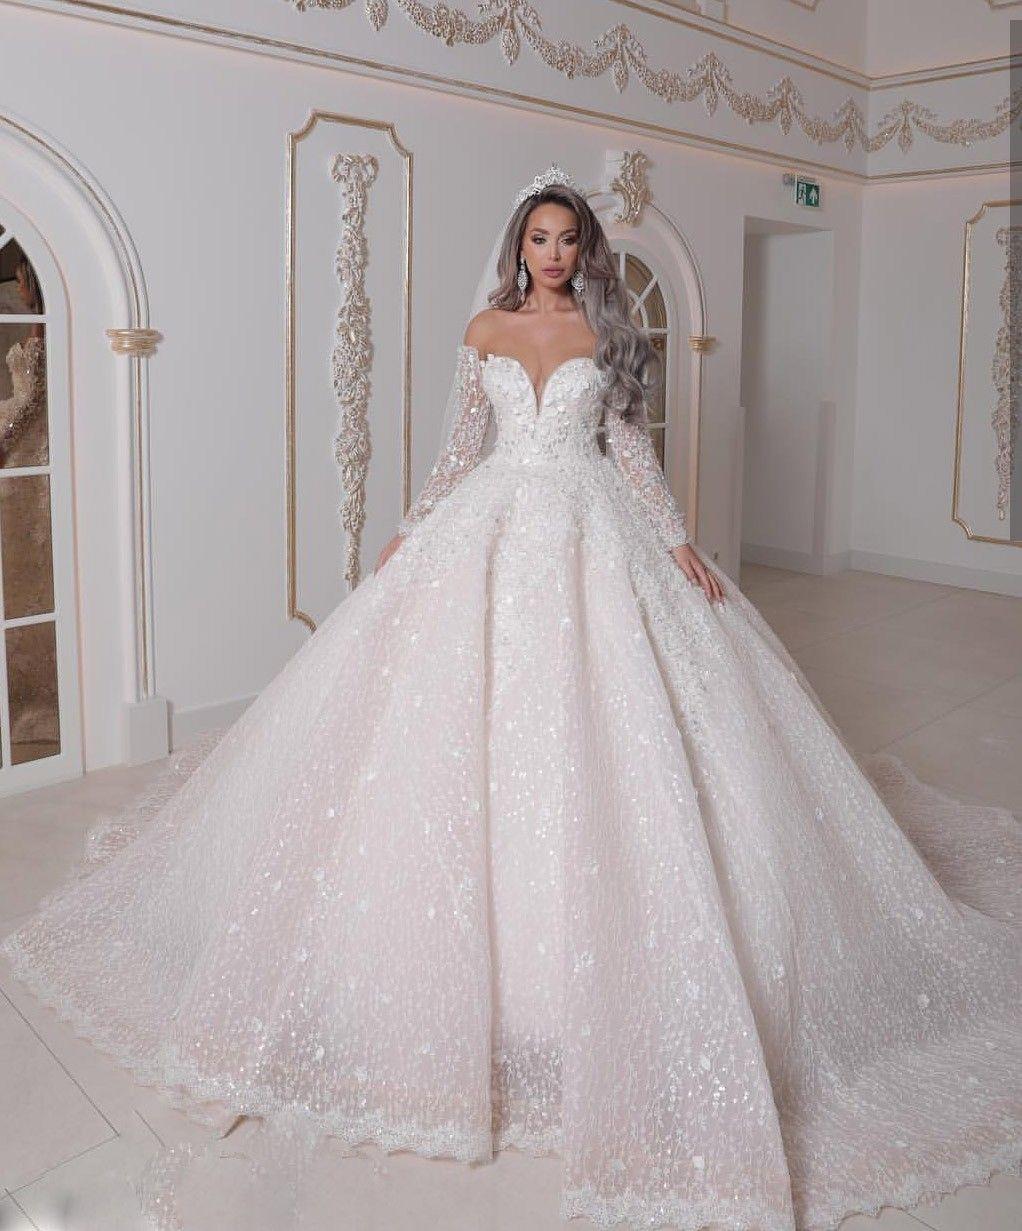 Elegant Wedding Dress Fancy Wedding Dresses Wedding Dresses Lace Elegant Wedding Dress